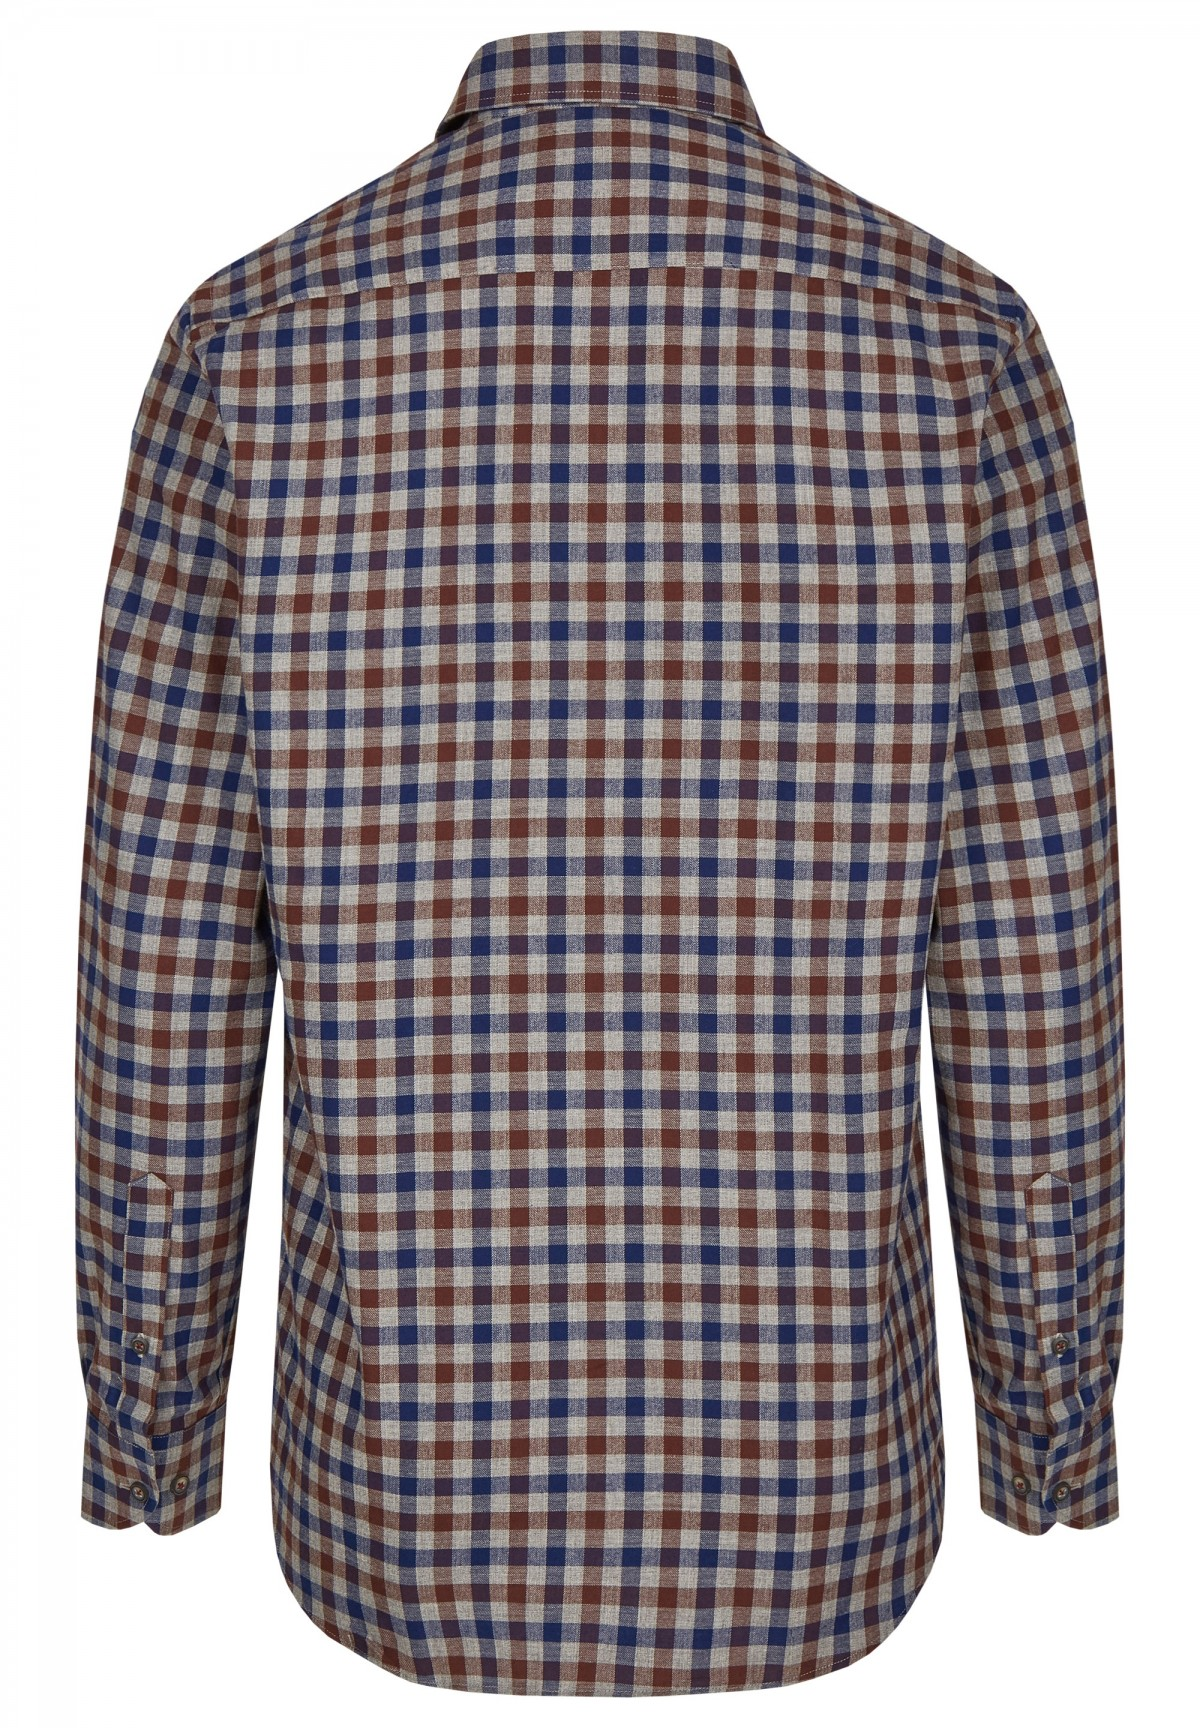 Legeres Freizeithemd in Karo-Muster / Legeres Freizeithemd in Karo-Muster